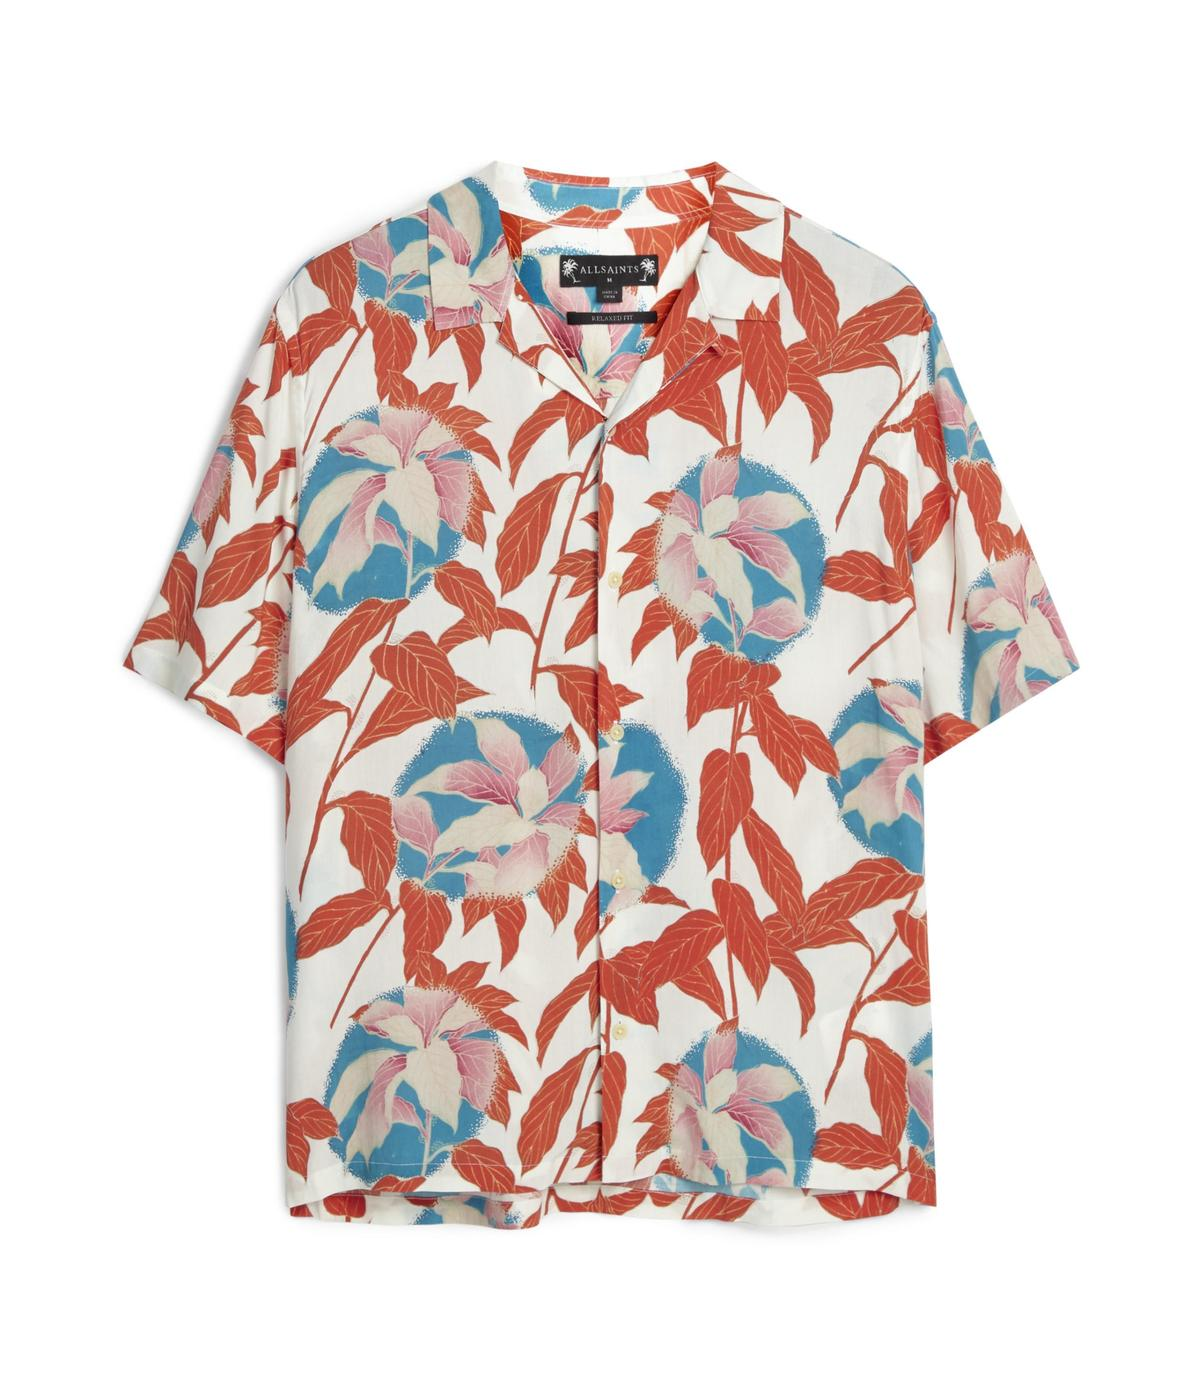 ALLSAINTS Vine紅葉印花襯衫。NT$4,800(ALLSAINTS提供)